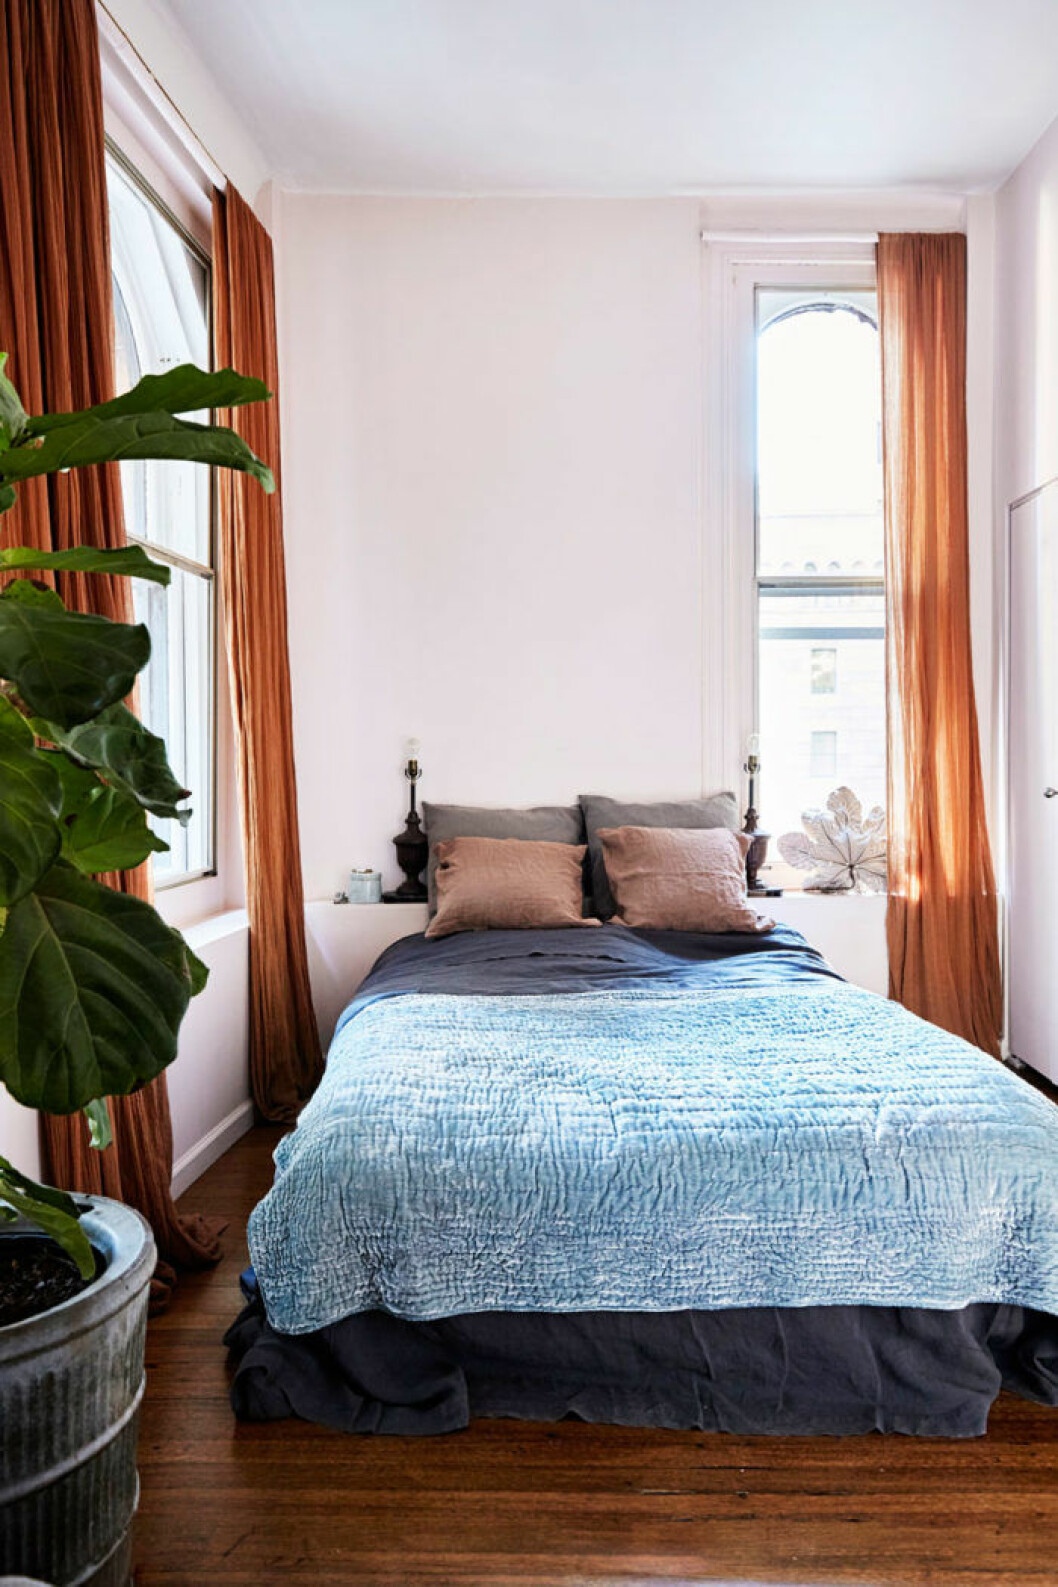 Mysigt inrett sovrum, orangea gardiner